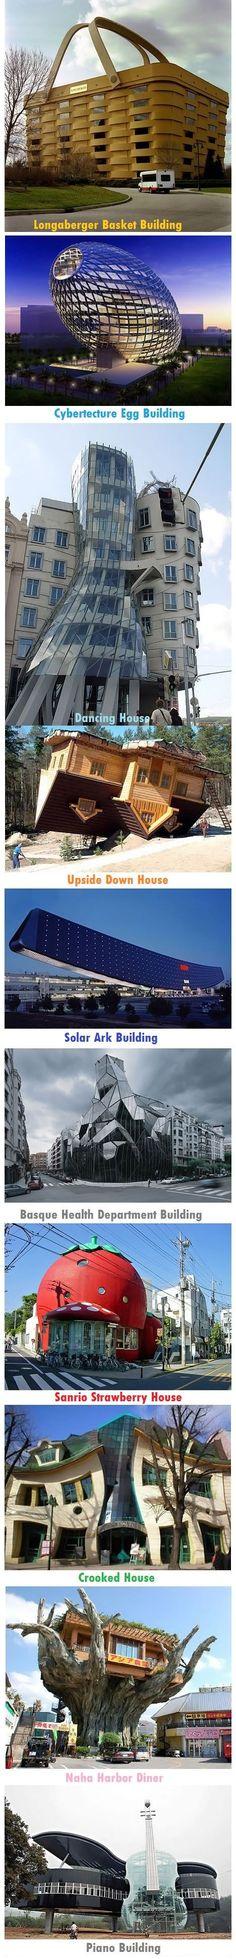 Unique buildings of the world.